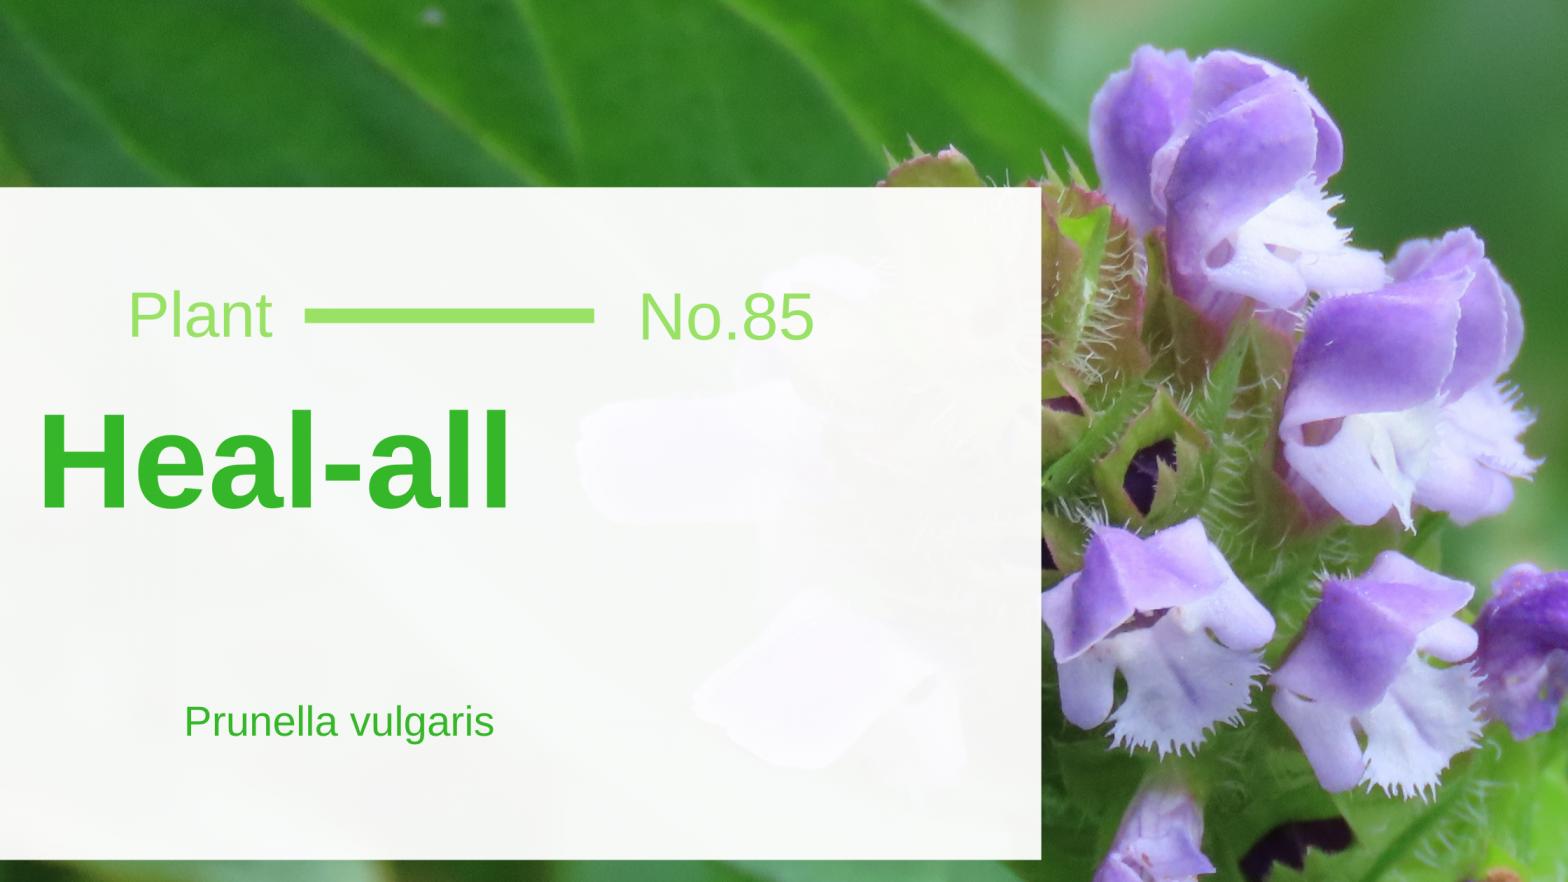 Heal-All - Prunella Vulgaris: Another Woundwort of Edible & Medicinal Wild Plants